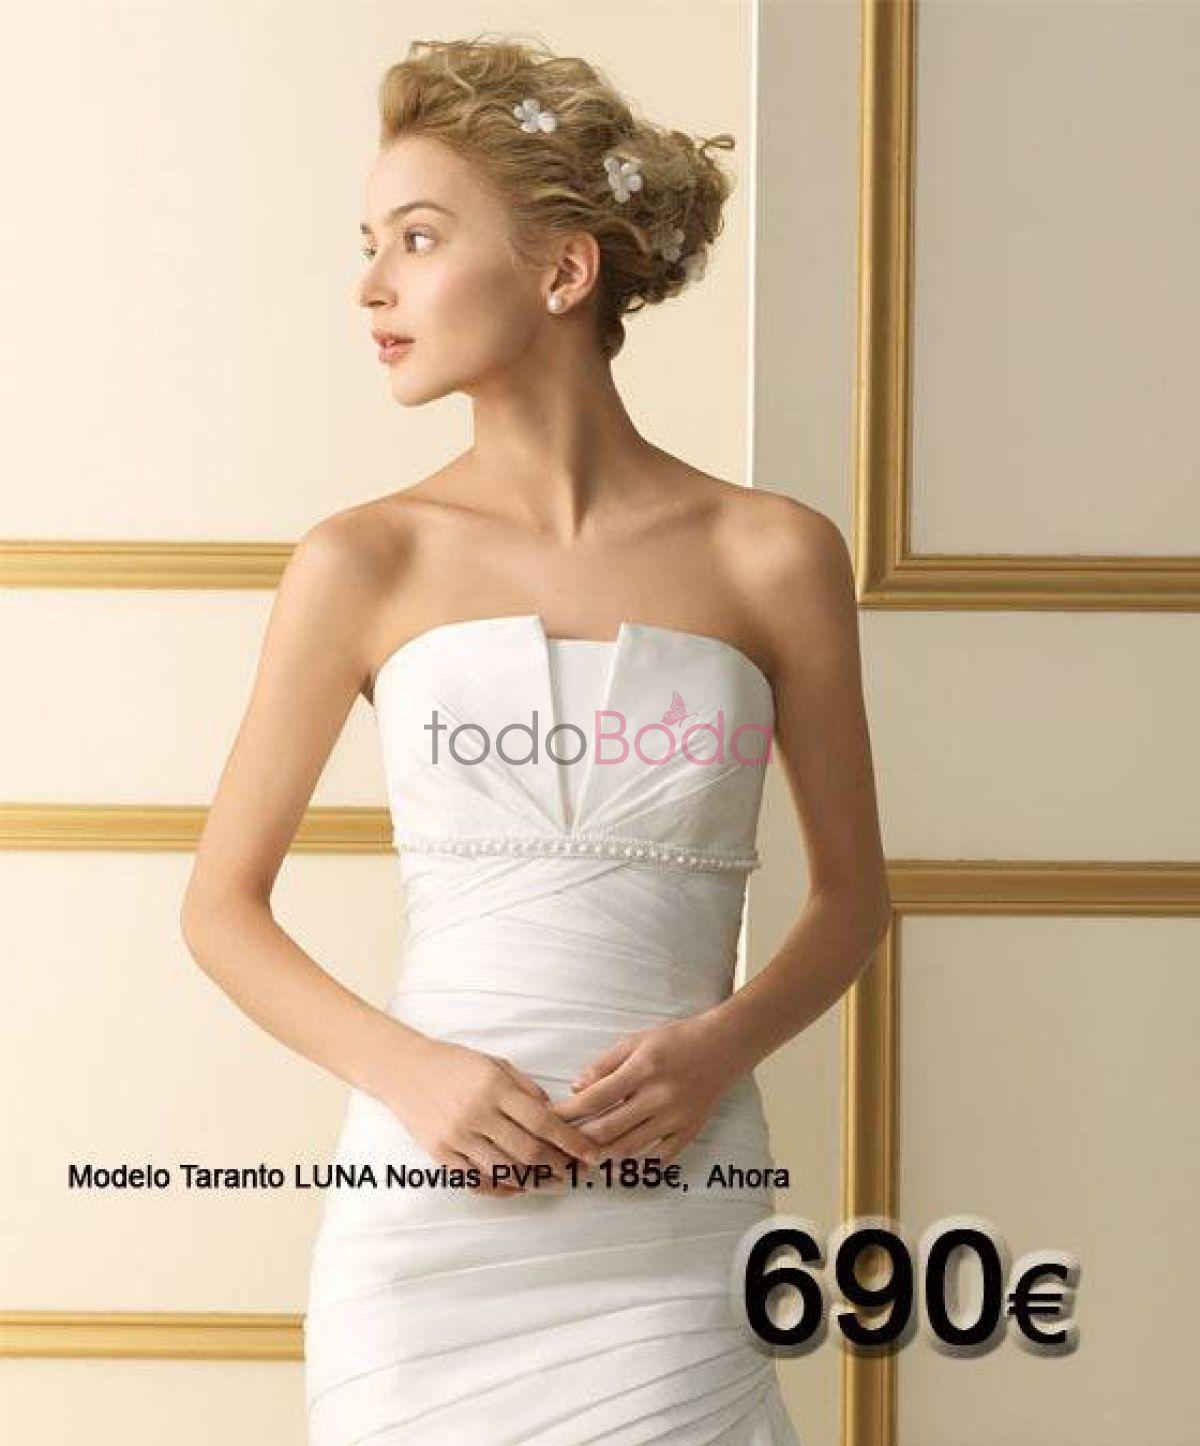 b918e375a TodoBoda.com - Los 5 mejores Outlets nupciales de Madrid